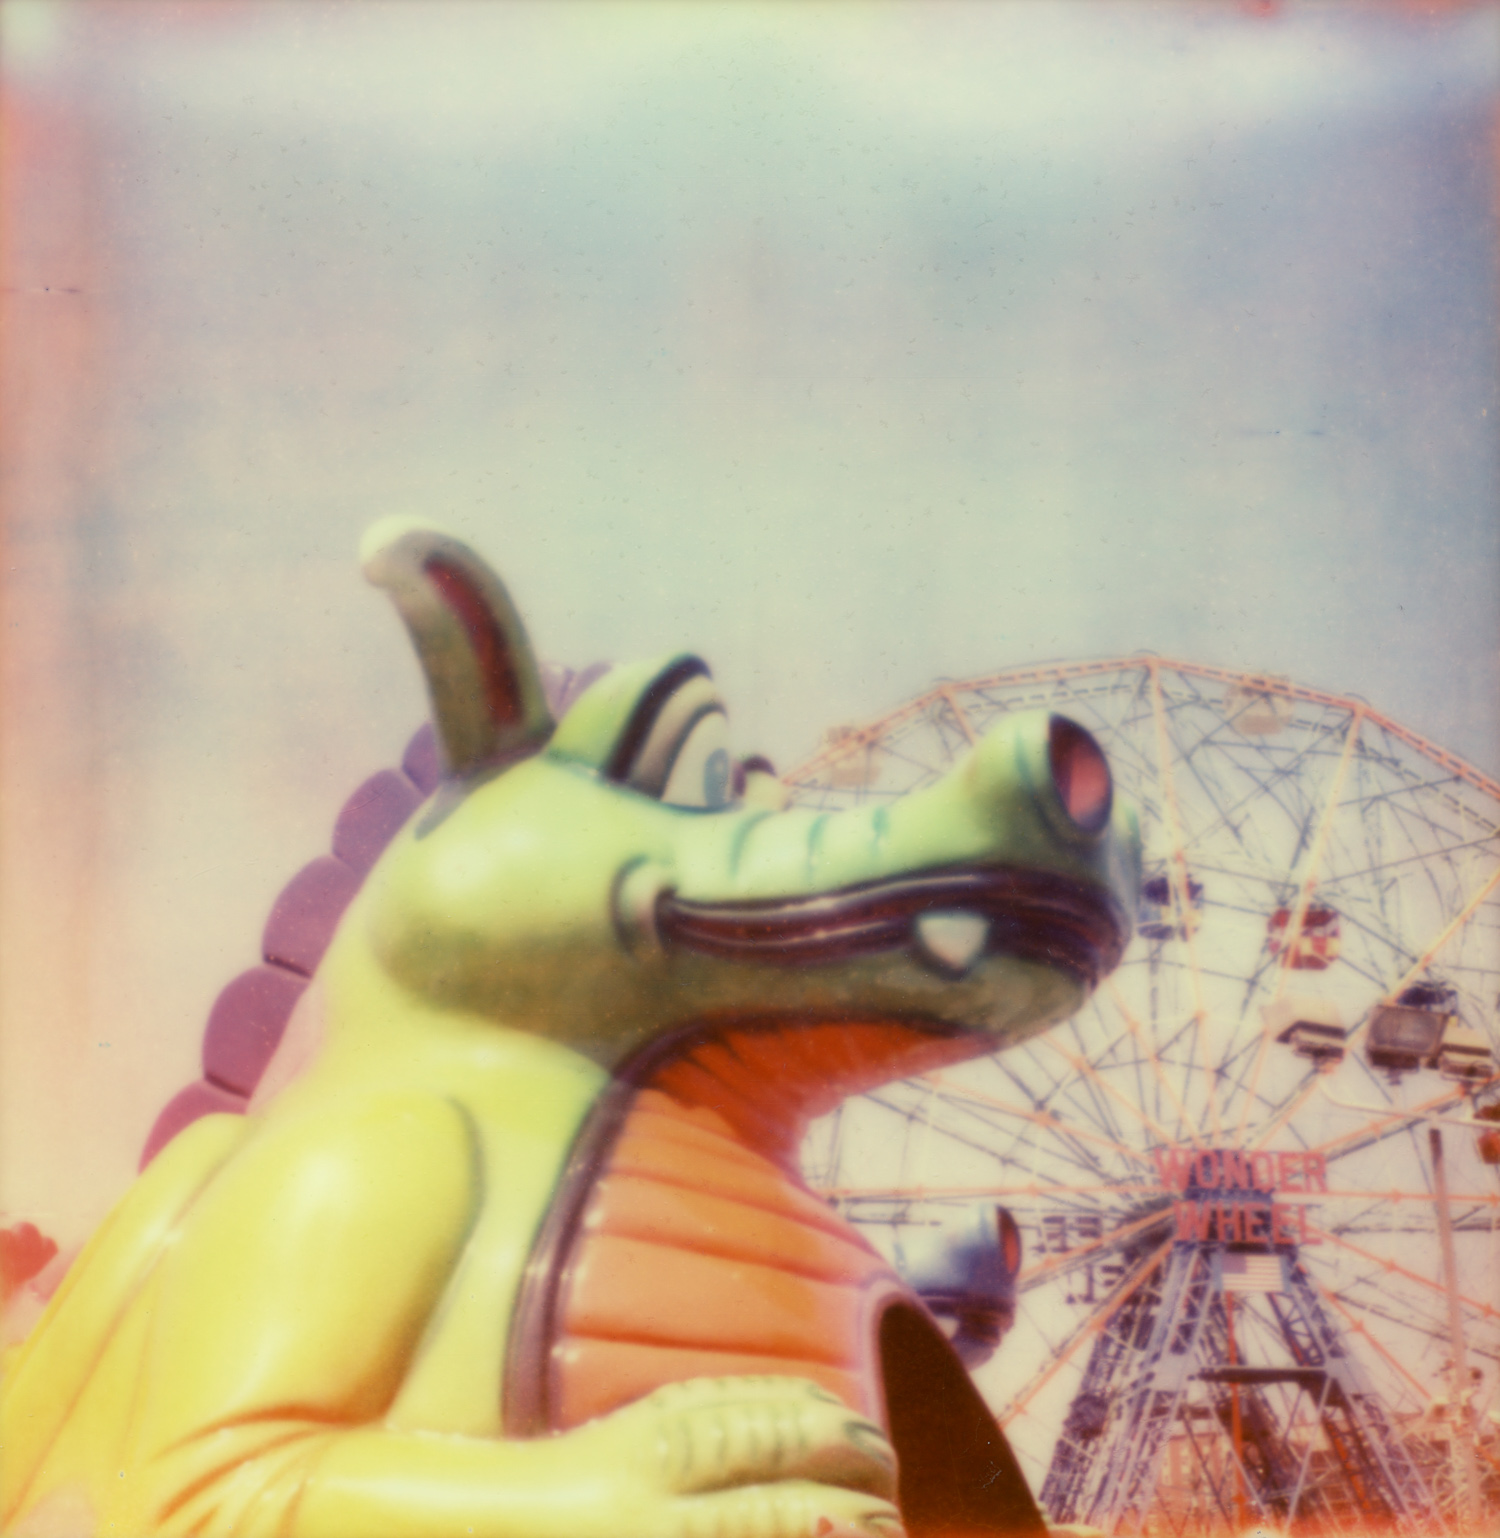 New-York-Polaroids-by-On-a-hazy-morning-Amsterdam017.jpg